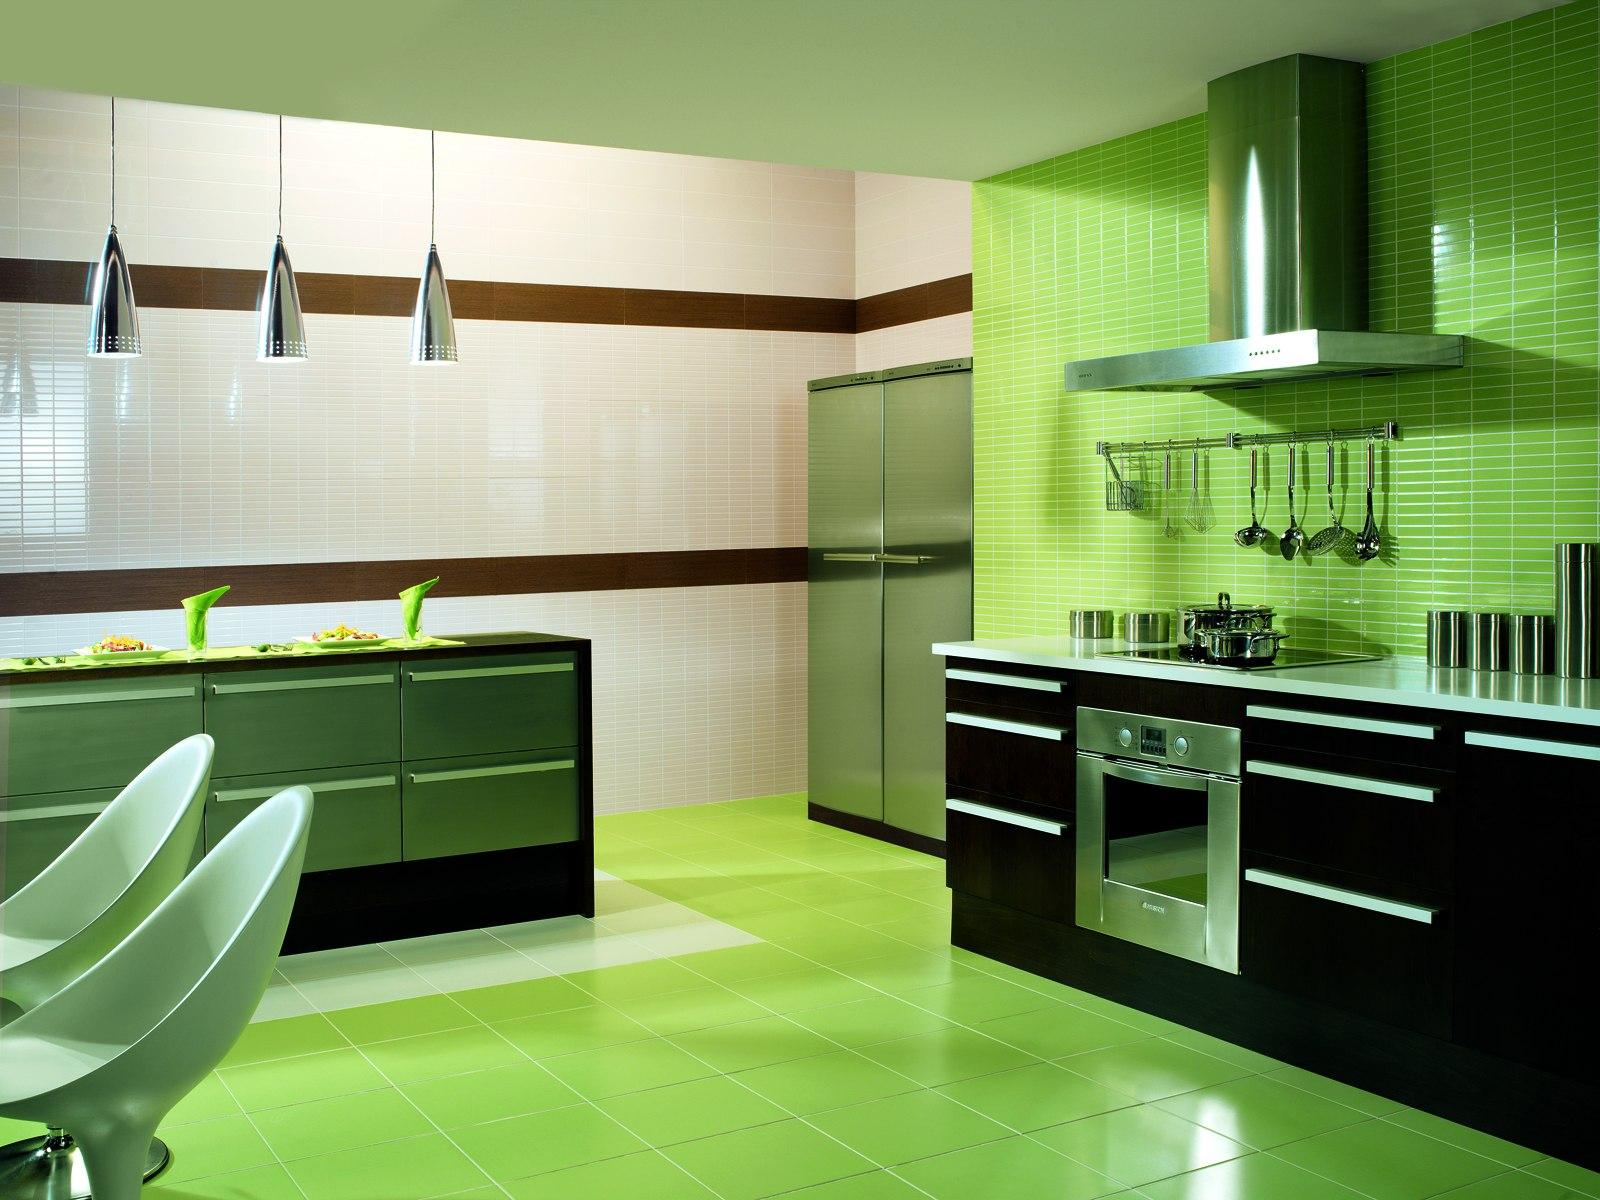 Carrelage vert en gr s c rame marazzi for Carrelage marazzi salle de bain